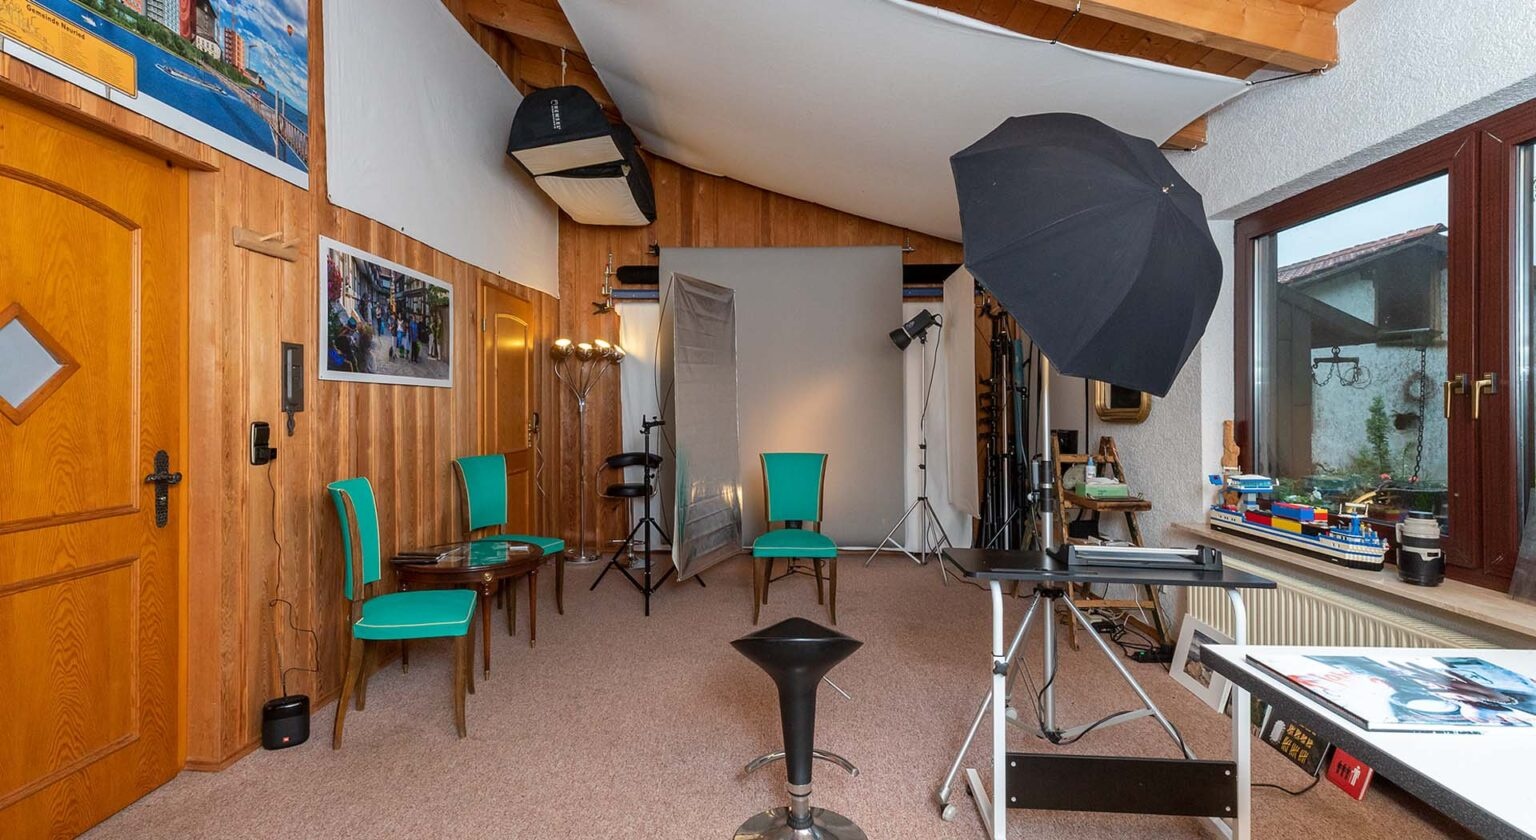 Fotograf Hubert Braxmaier Innenaufnahme des Studios